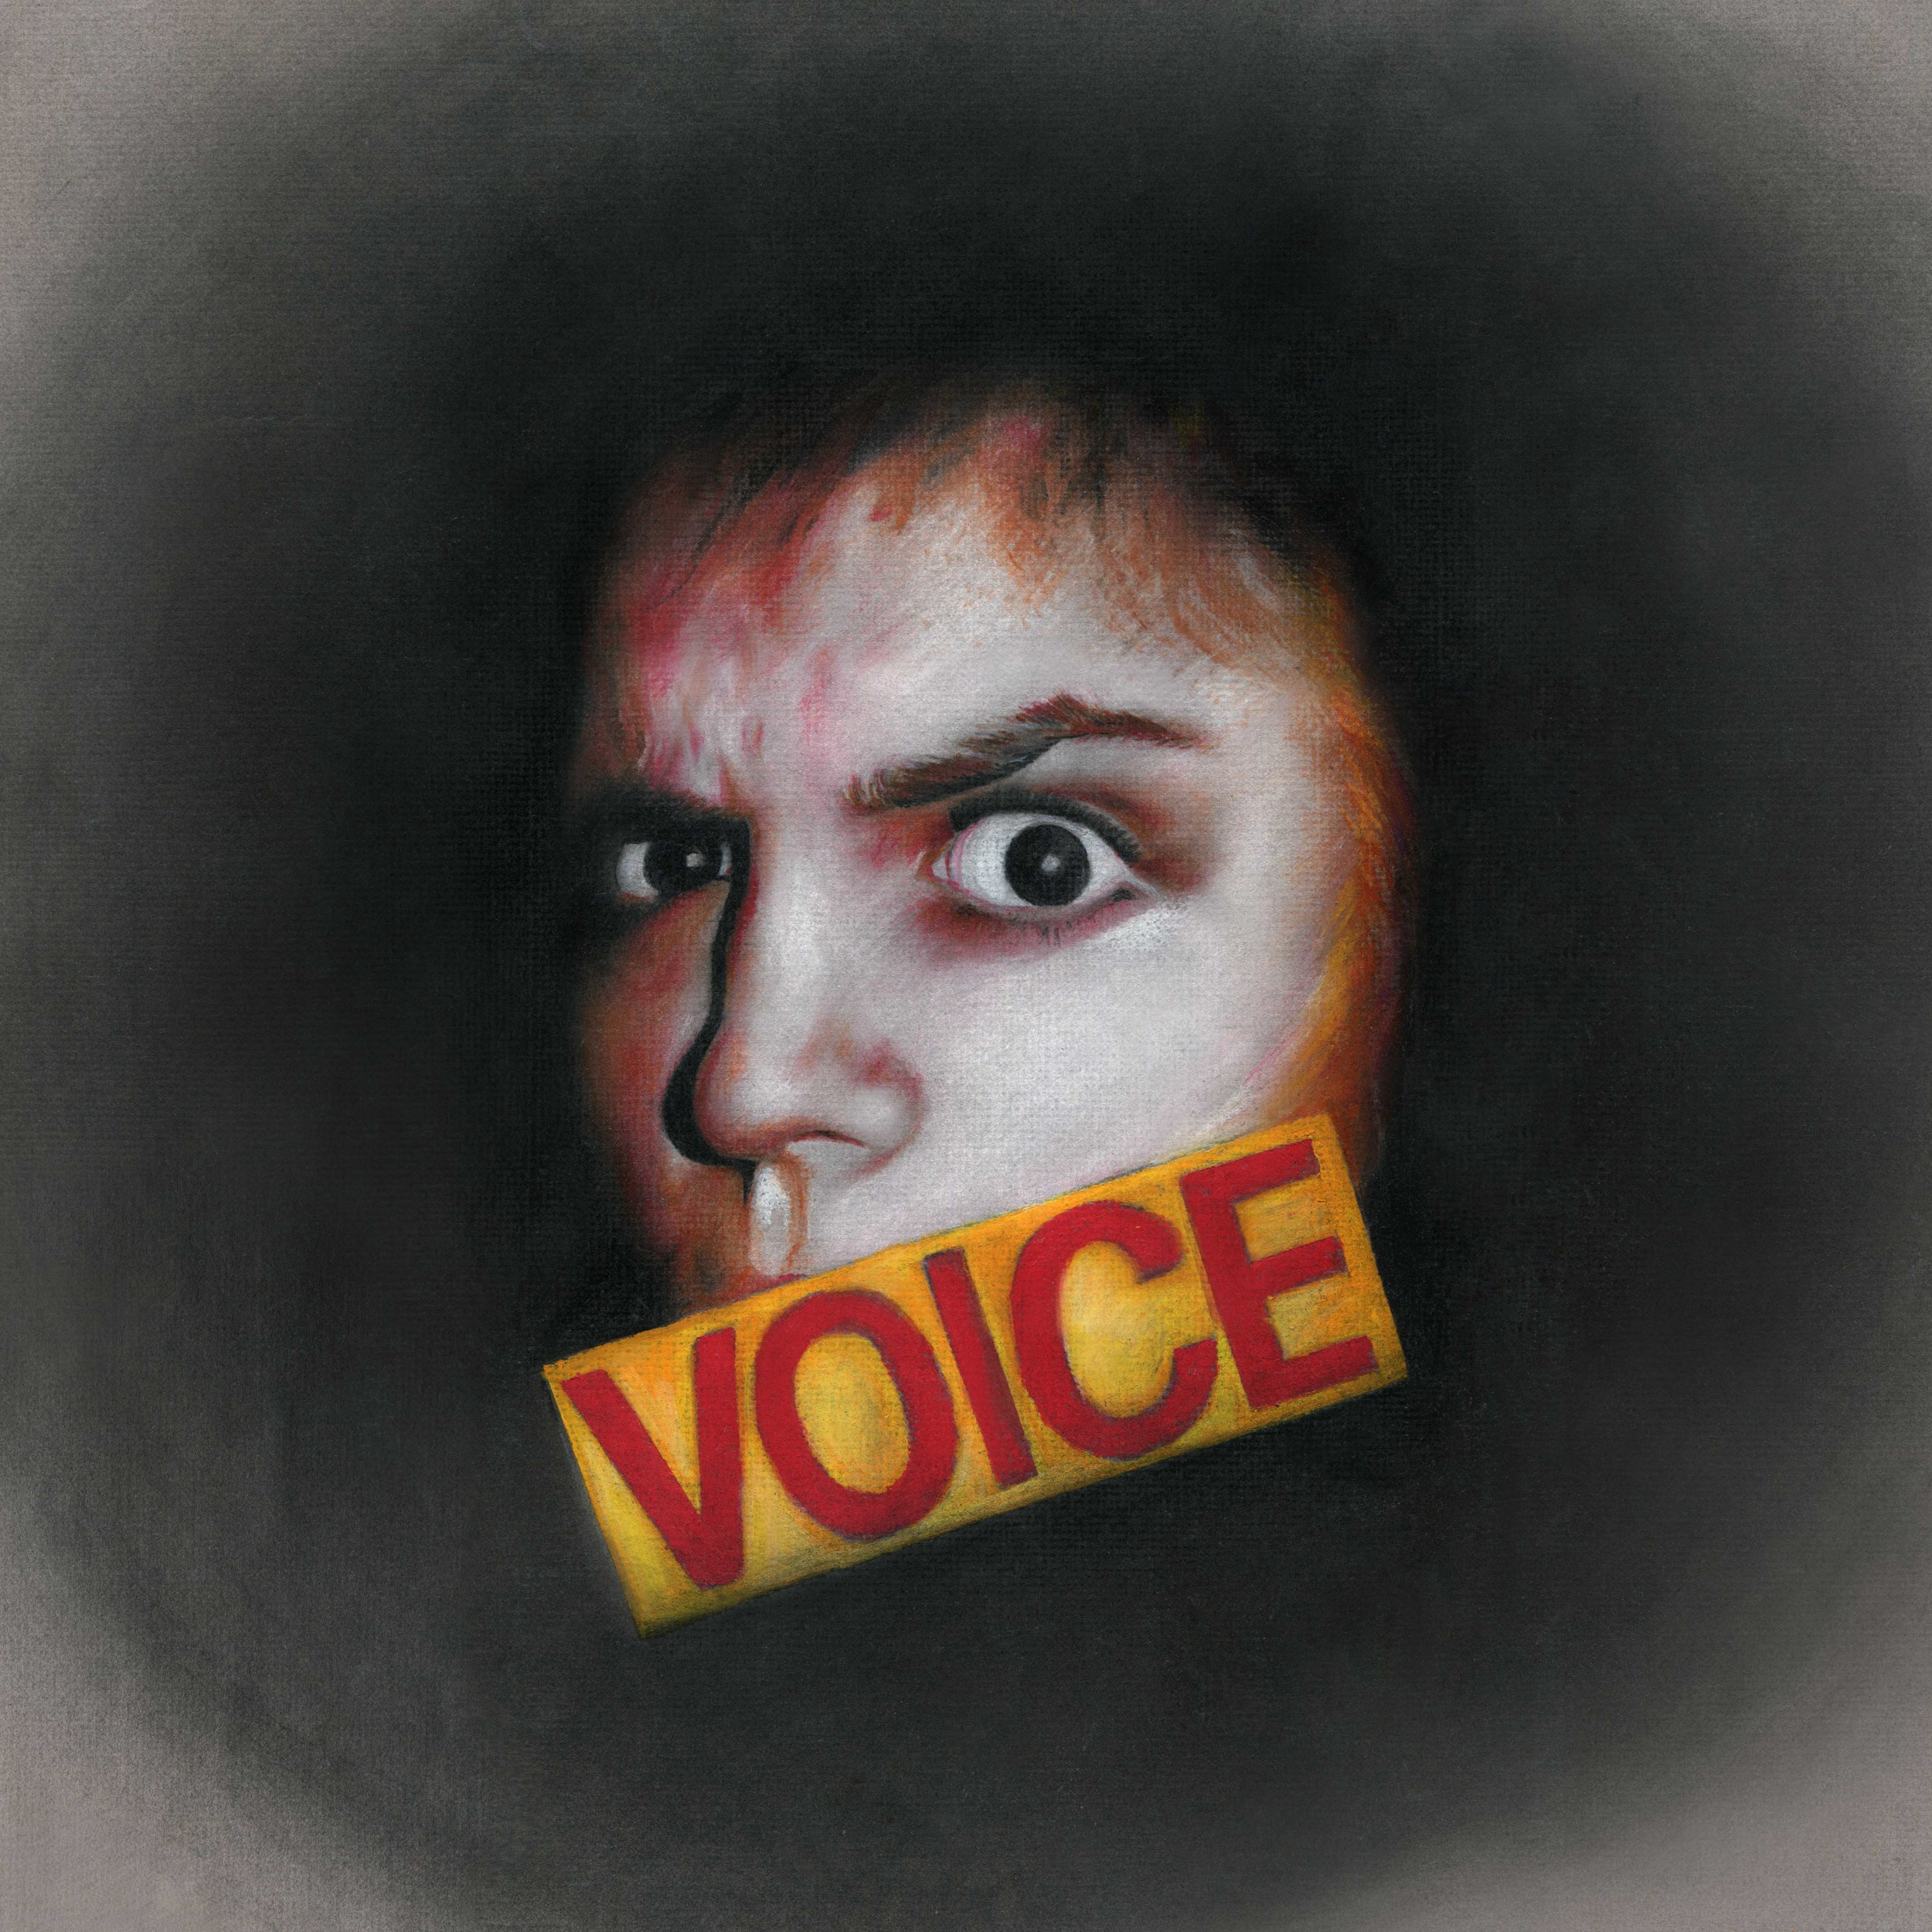 Voice Web File.jpg